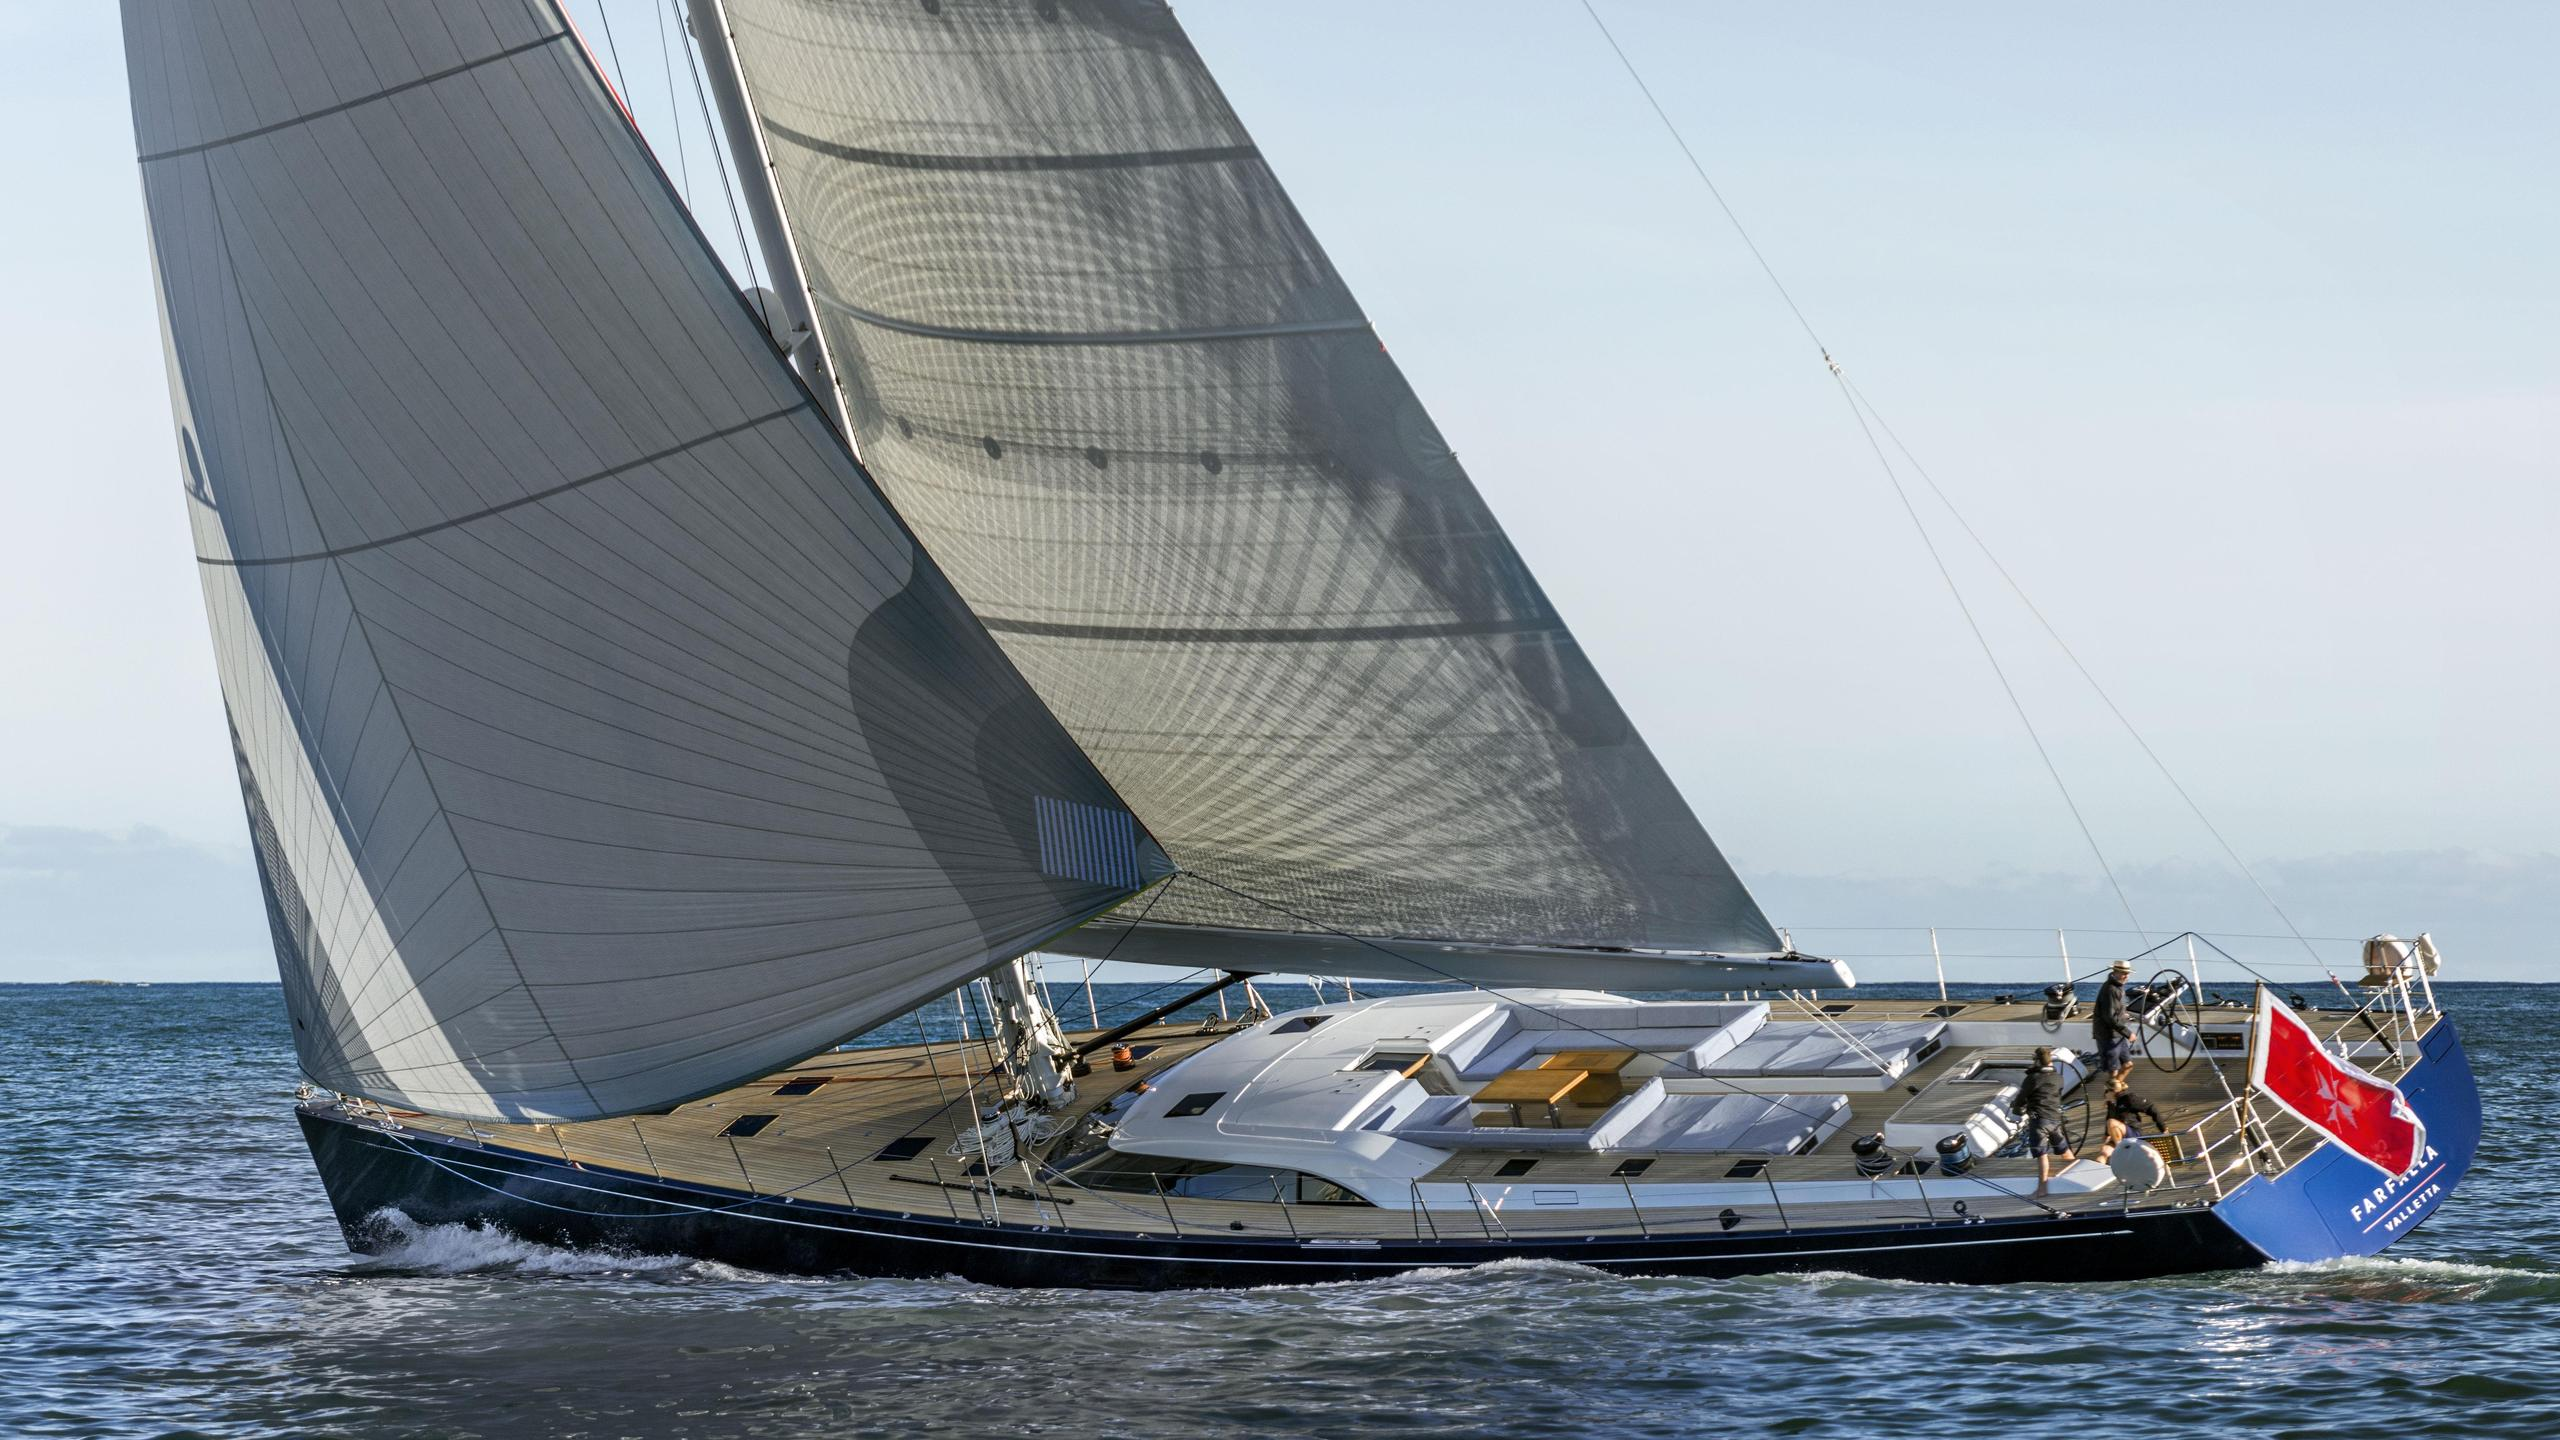 farfalla-sailing-yacht-southern-wind-2014-32m-cruising-half-profile